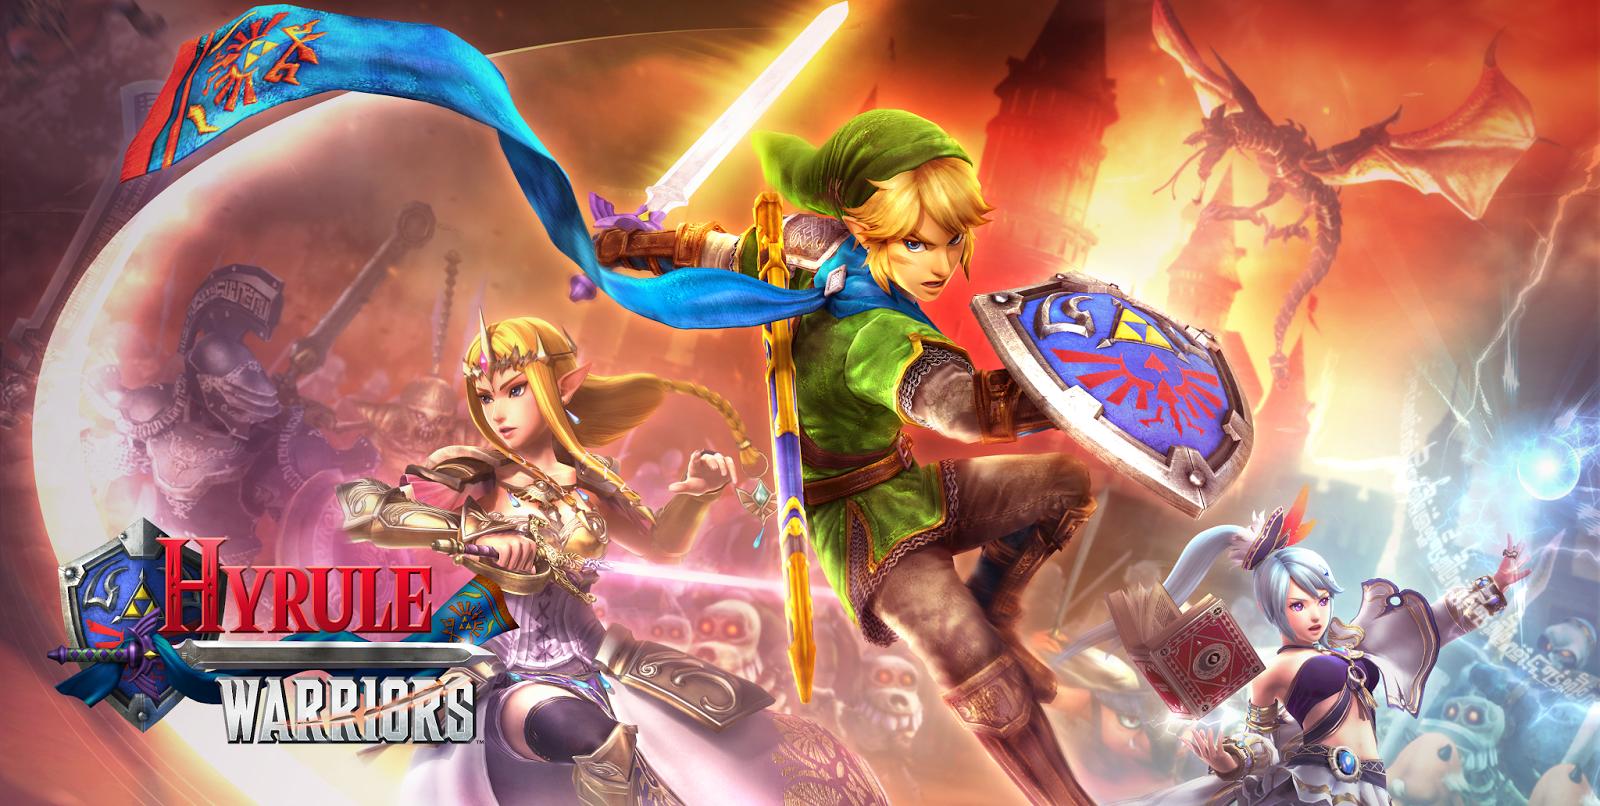 Hyrule Warriors (Wii U) Review